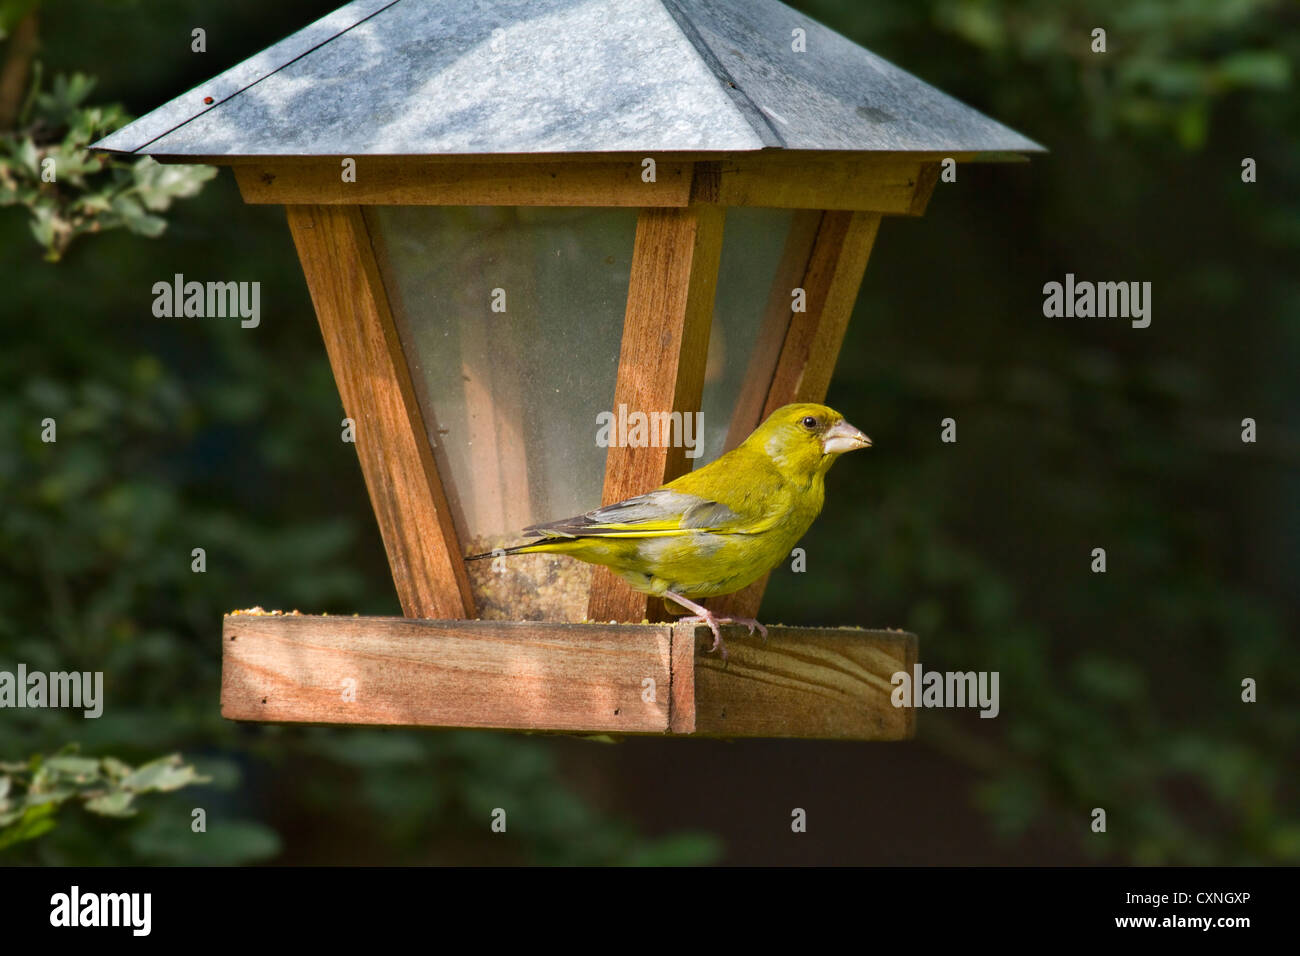 European Greenfinch (Carduelis chloris) feeding from bird feeder in garden, Belgium Stock Photo